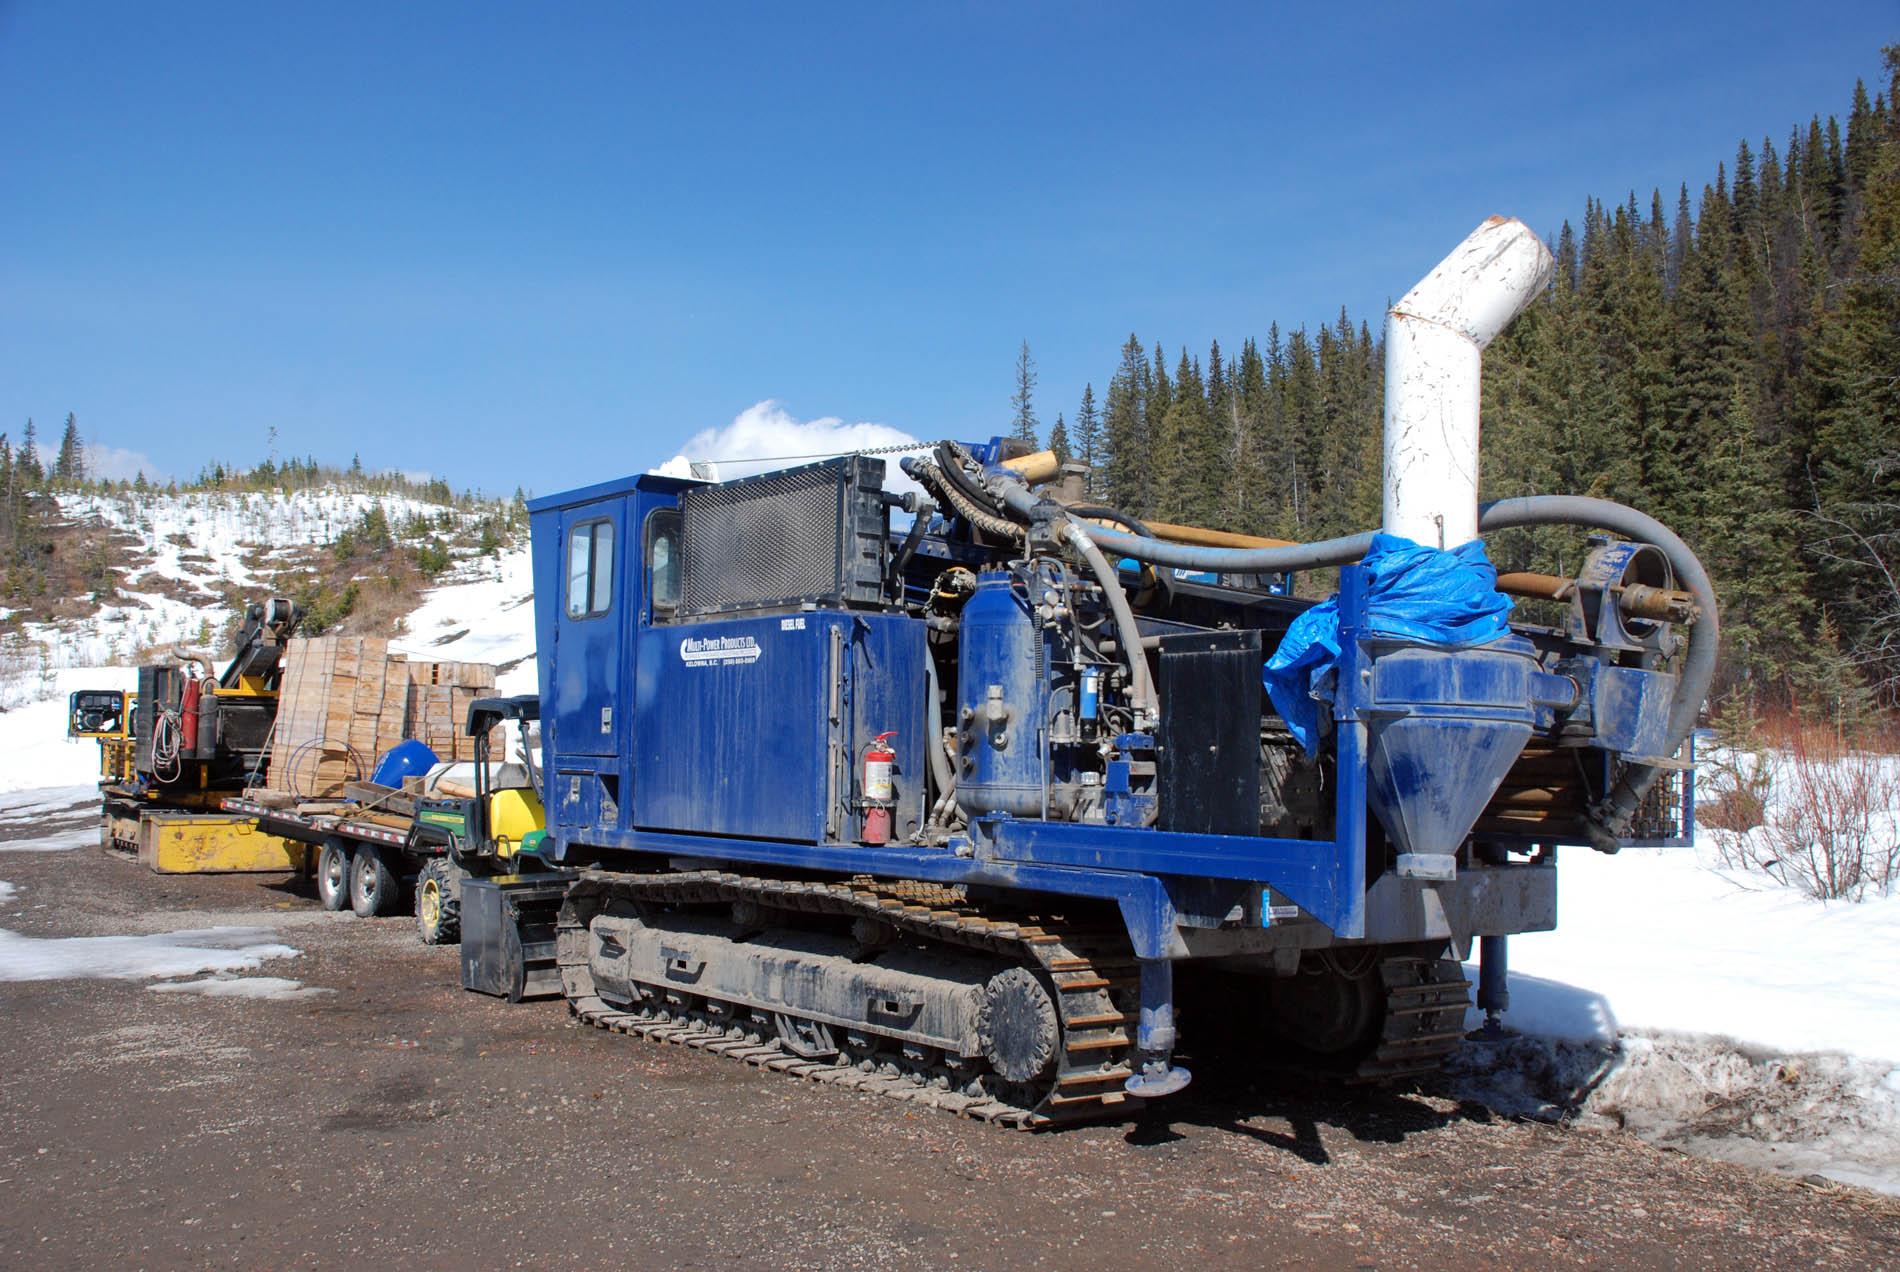 prospector-i-steel-tracked-rc-drilling-rig.jpg